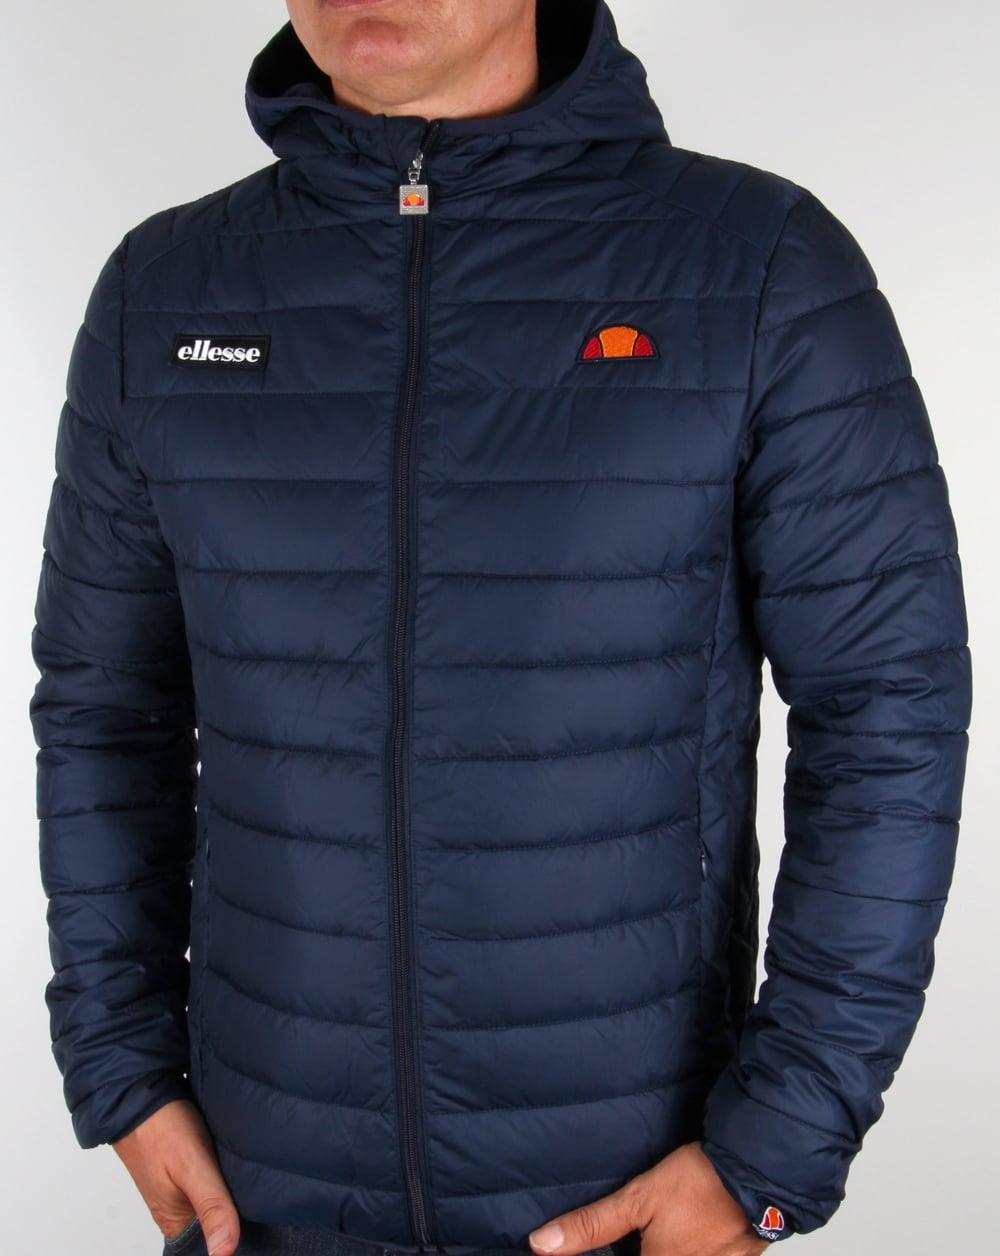 Xmas Gift Guide Ellesse Jacket